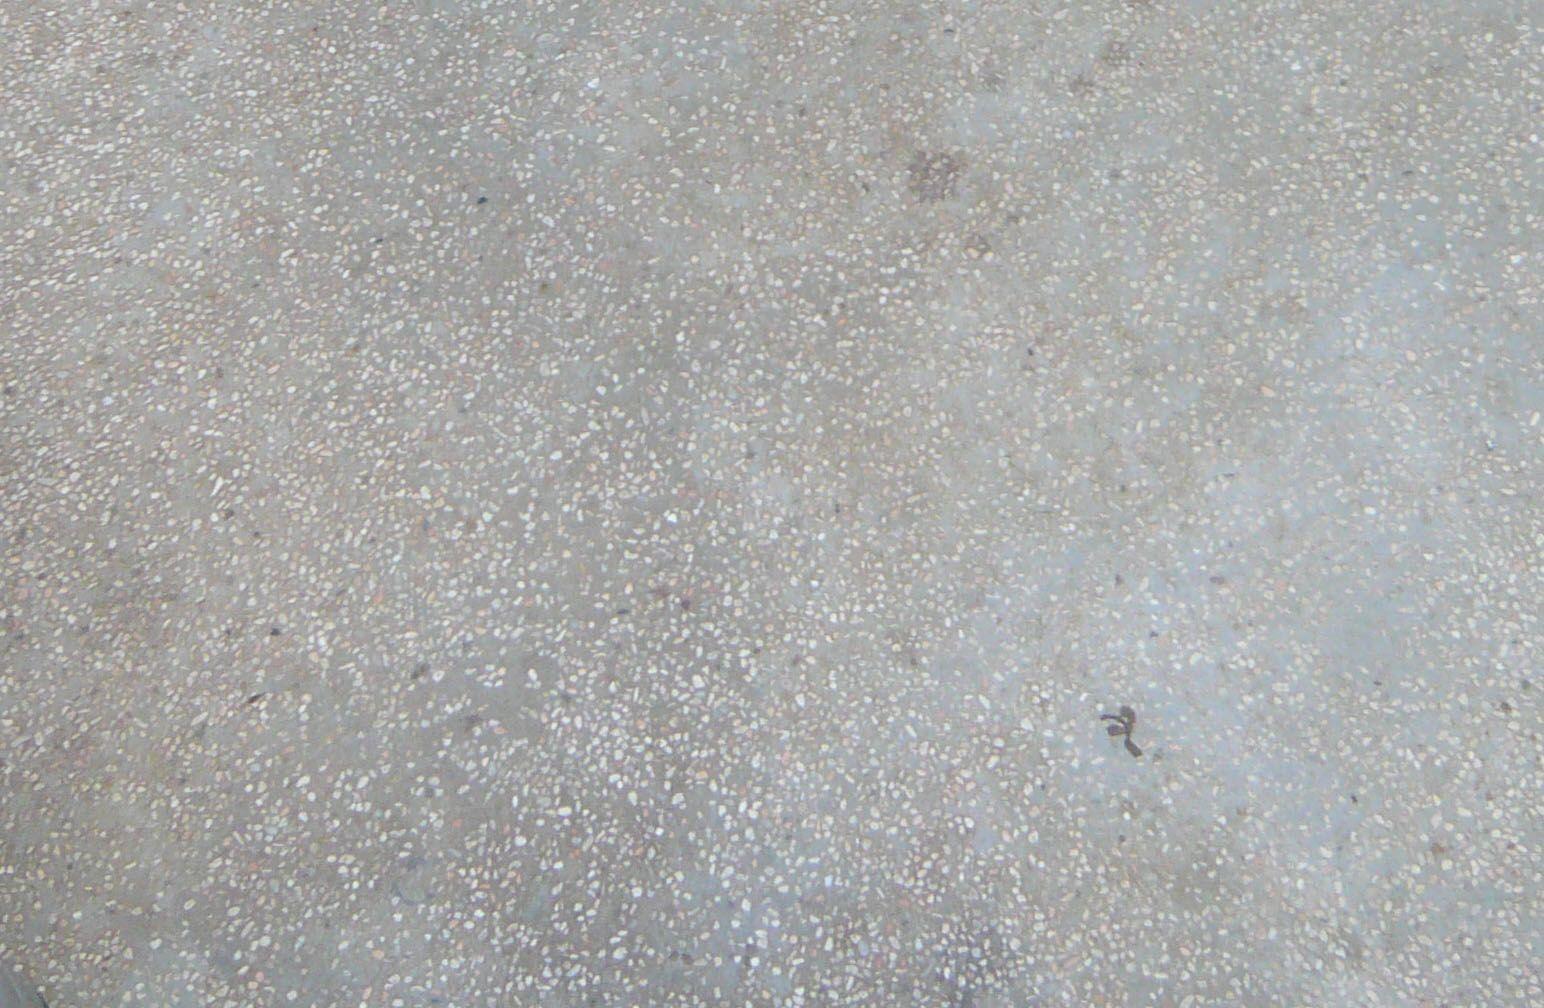 Concrete Aggregate With Small White Stones Material